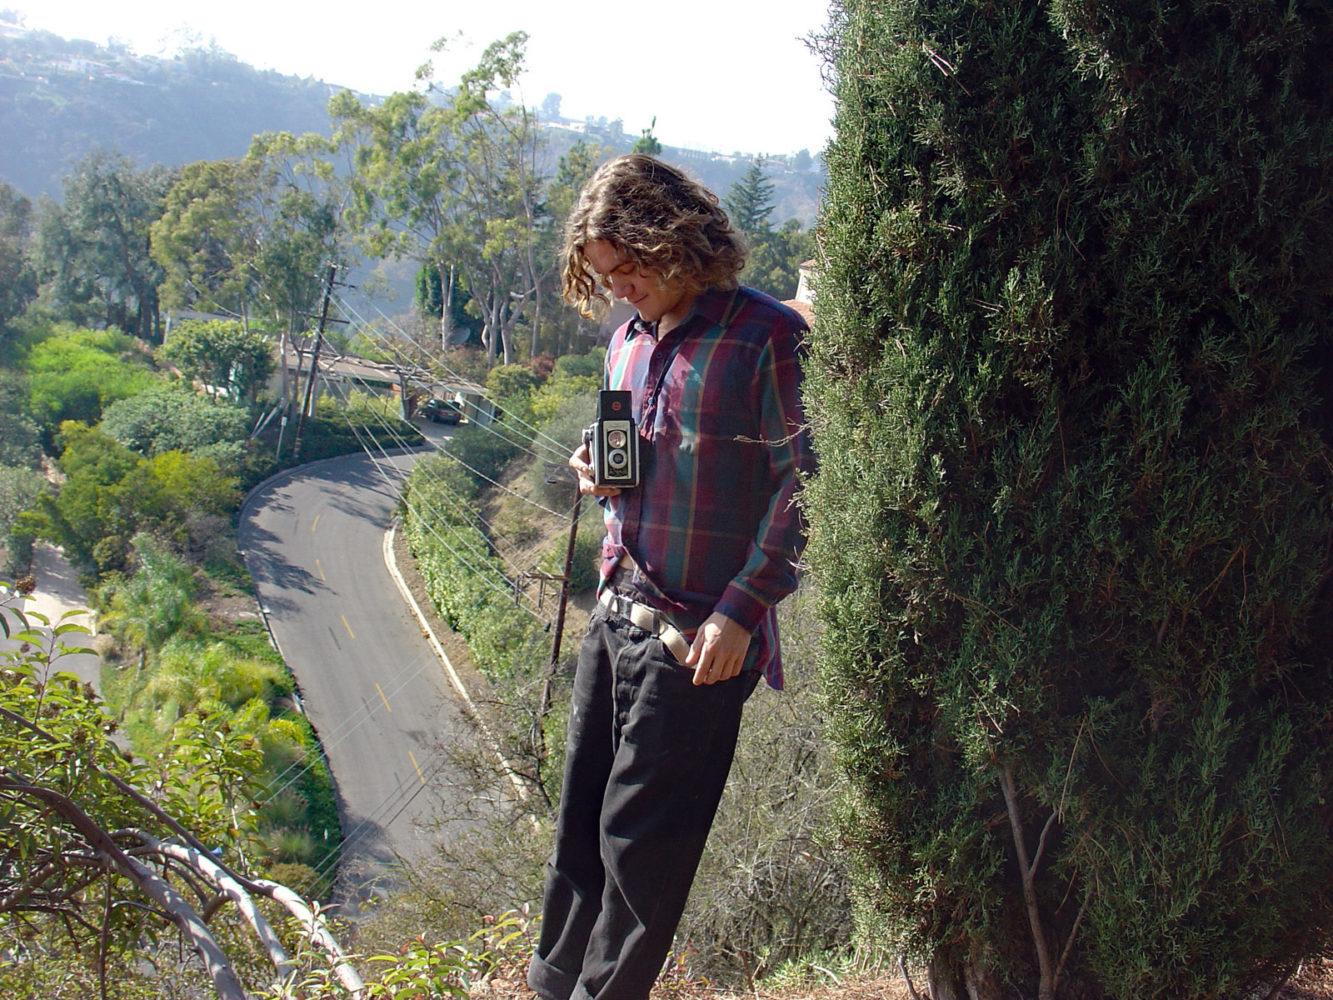 Andrew with his medium format Kodak camera